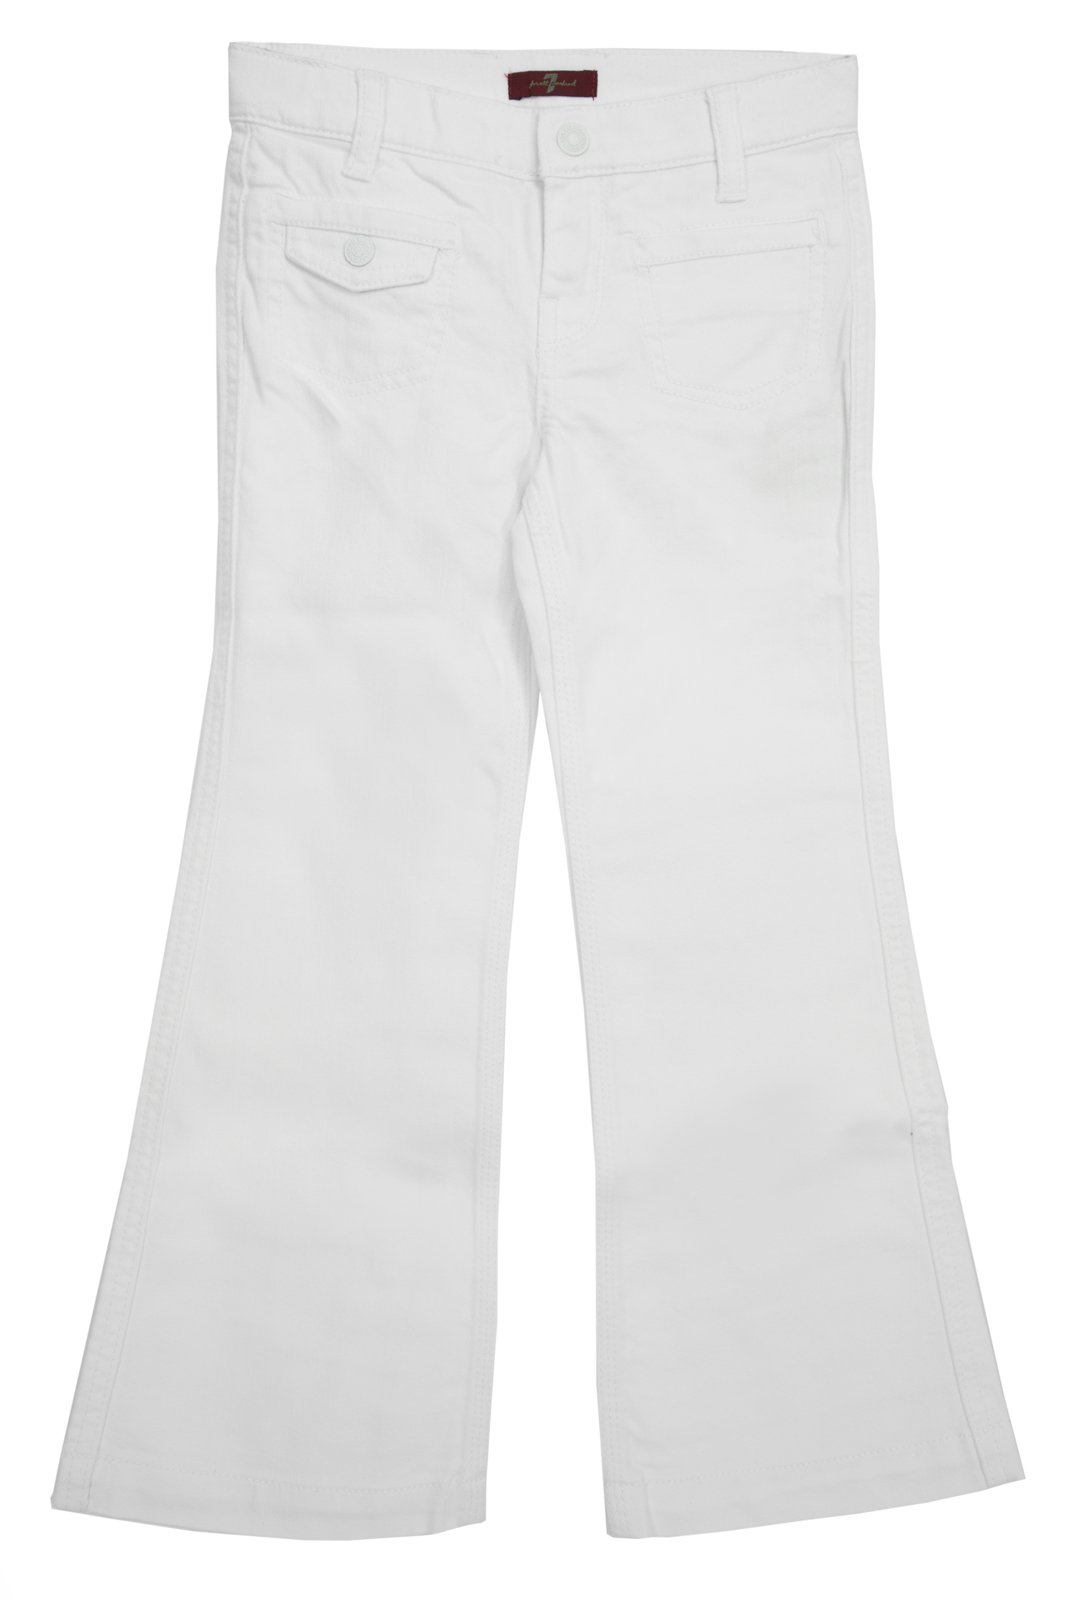 7 For All Mankind Little Girls' Georgia Jean, Clean White, 6